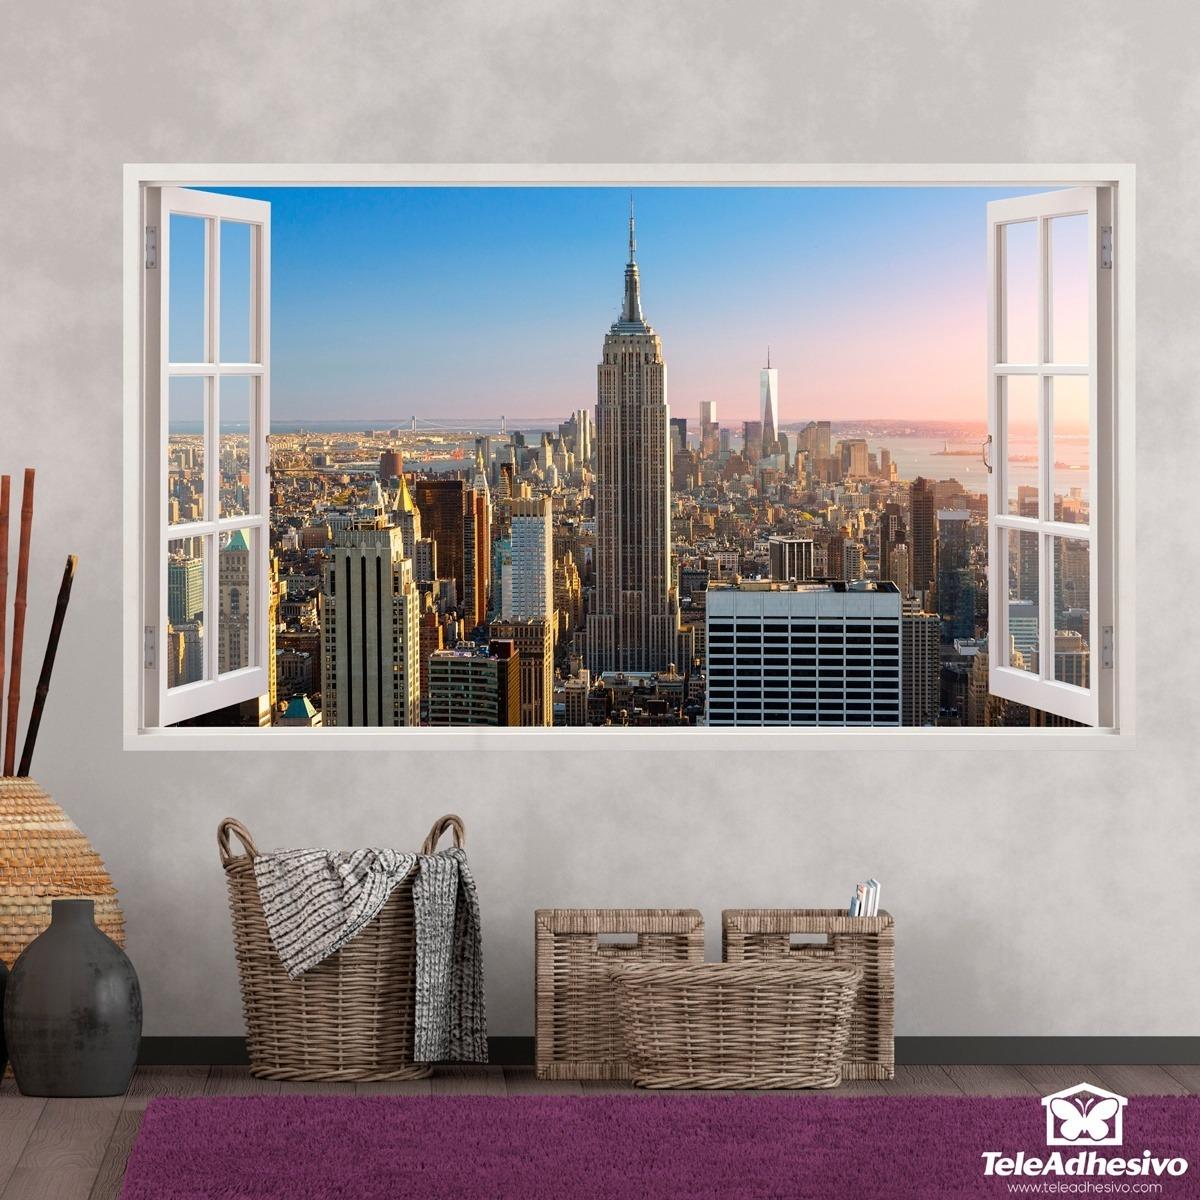 Vinilos decorativos de ventanas en teleadhesivo for Vinilos pared new york